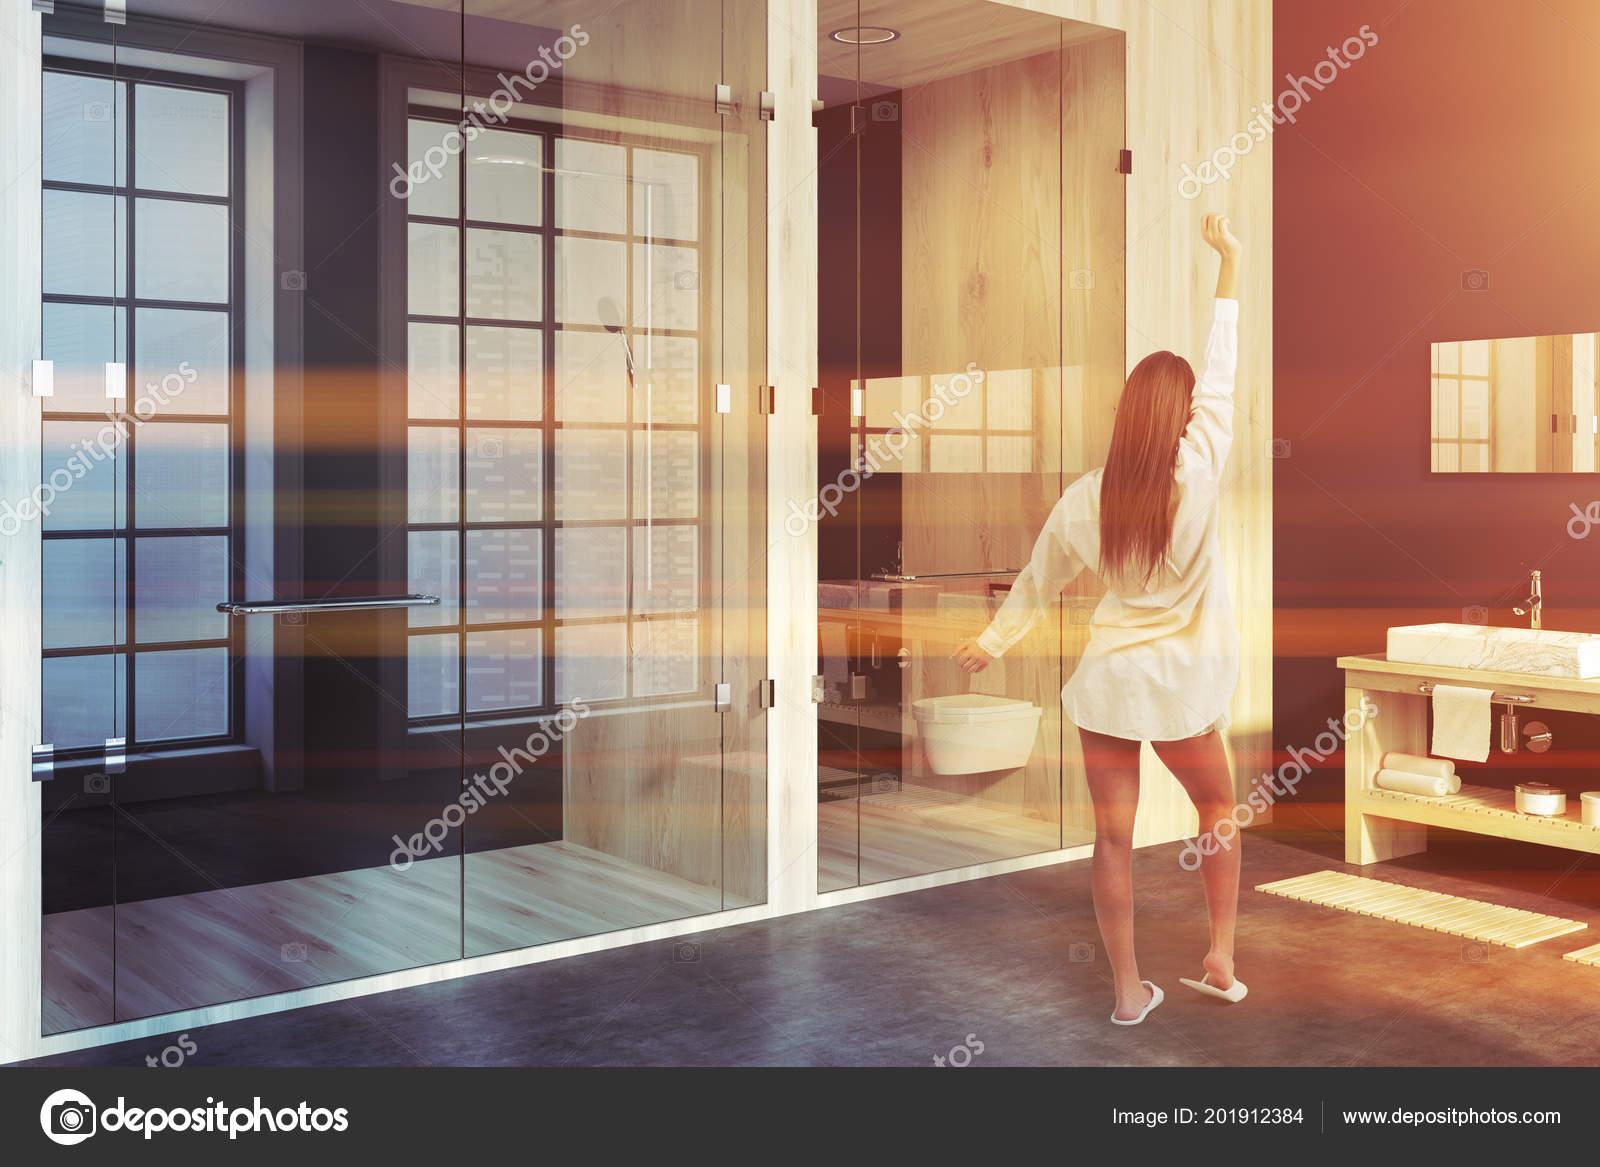 Douche Lavabo Coin Salle Bain Bois Bleu — Photographie ...